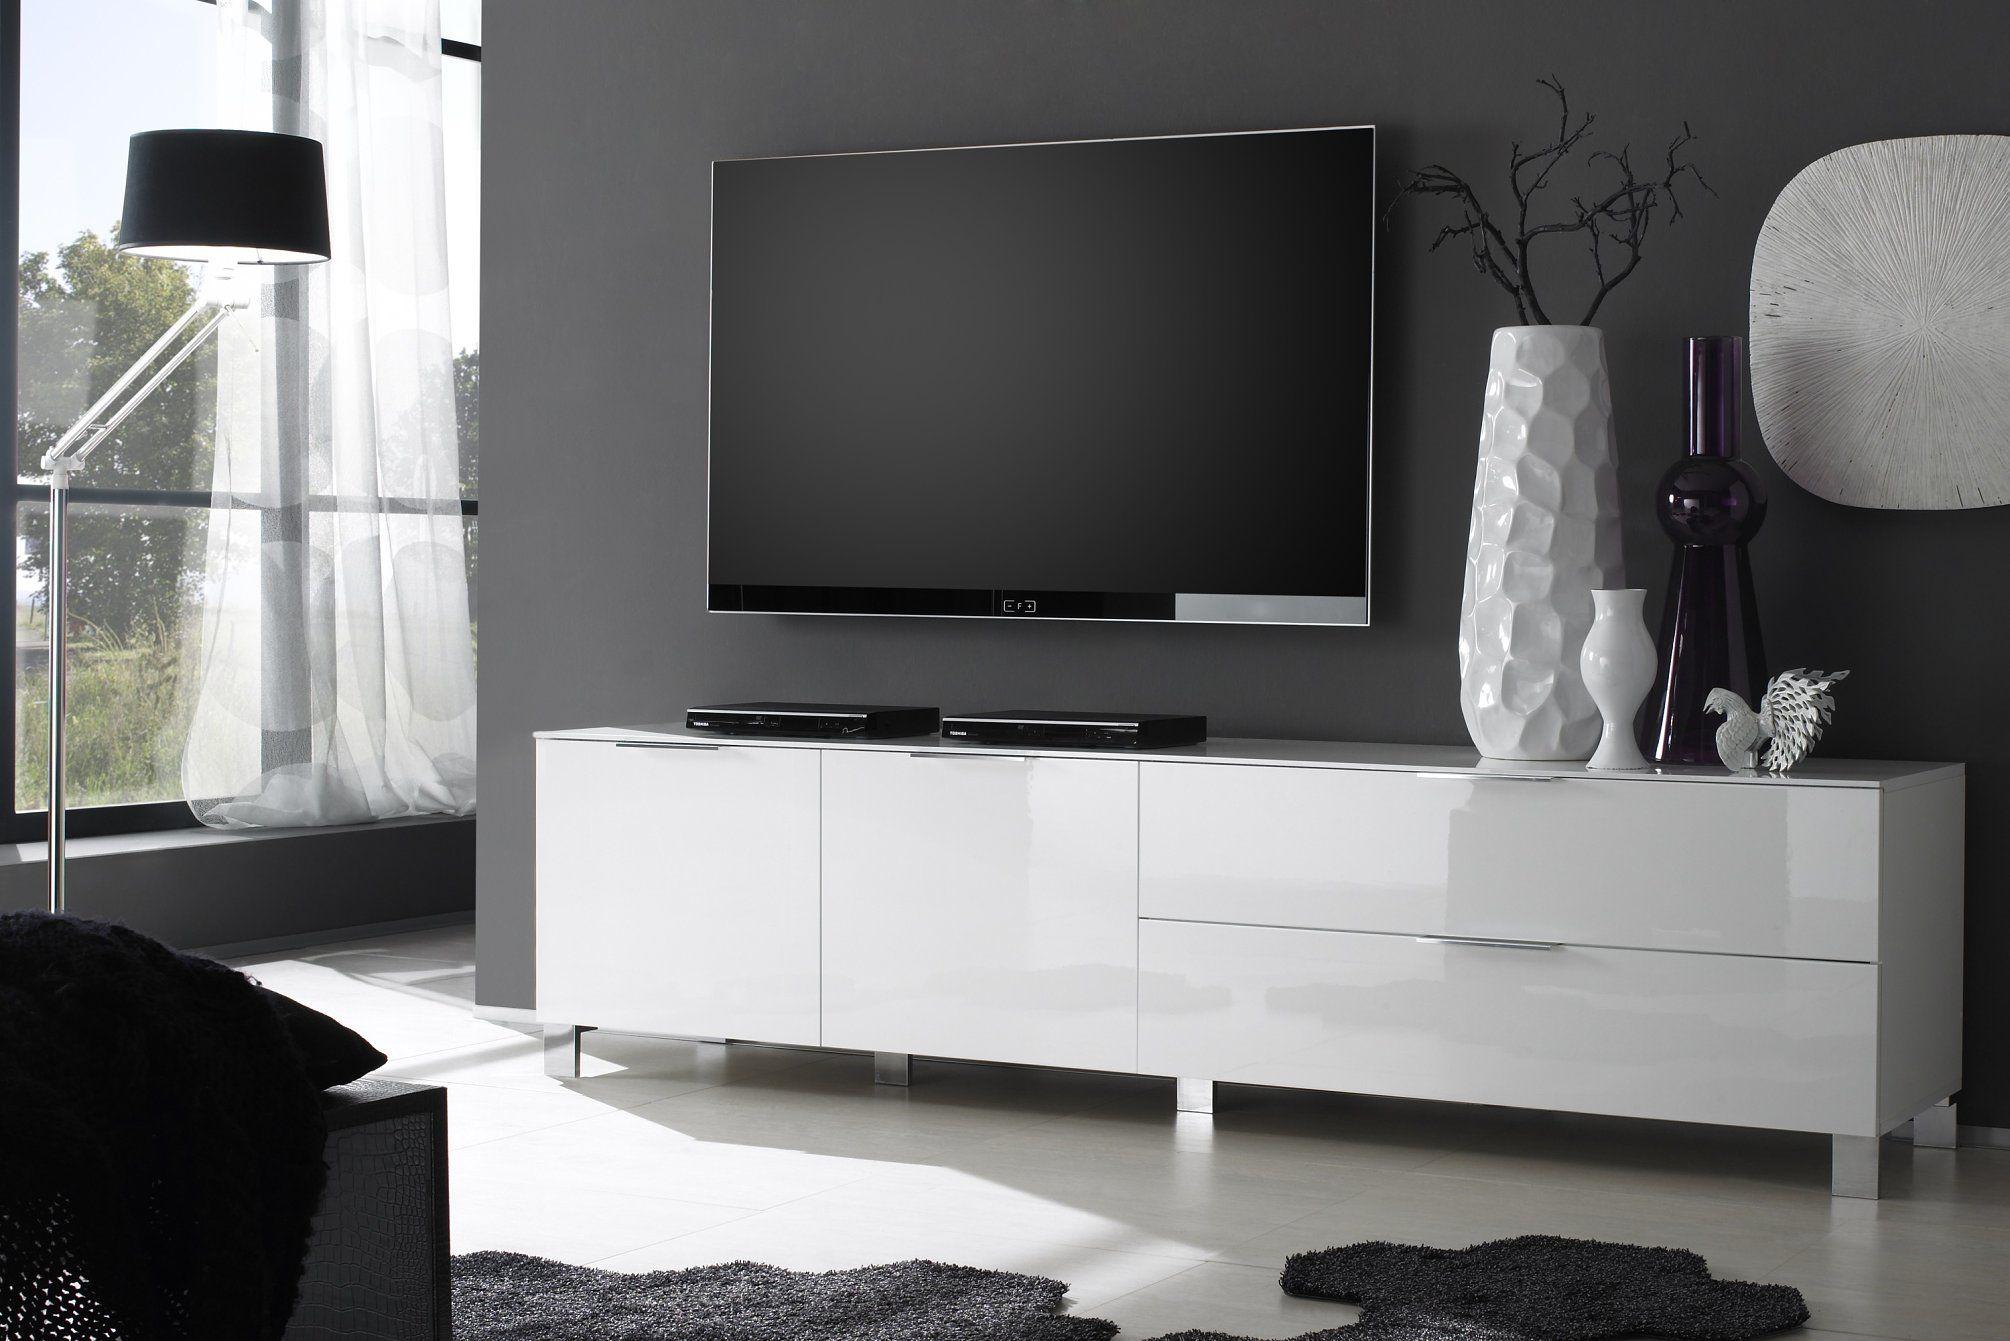 Sola Lowboard 210 Cm Chilli No Stue Tv Benk Tv Benk